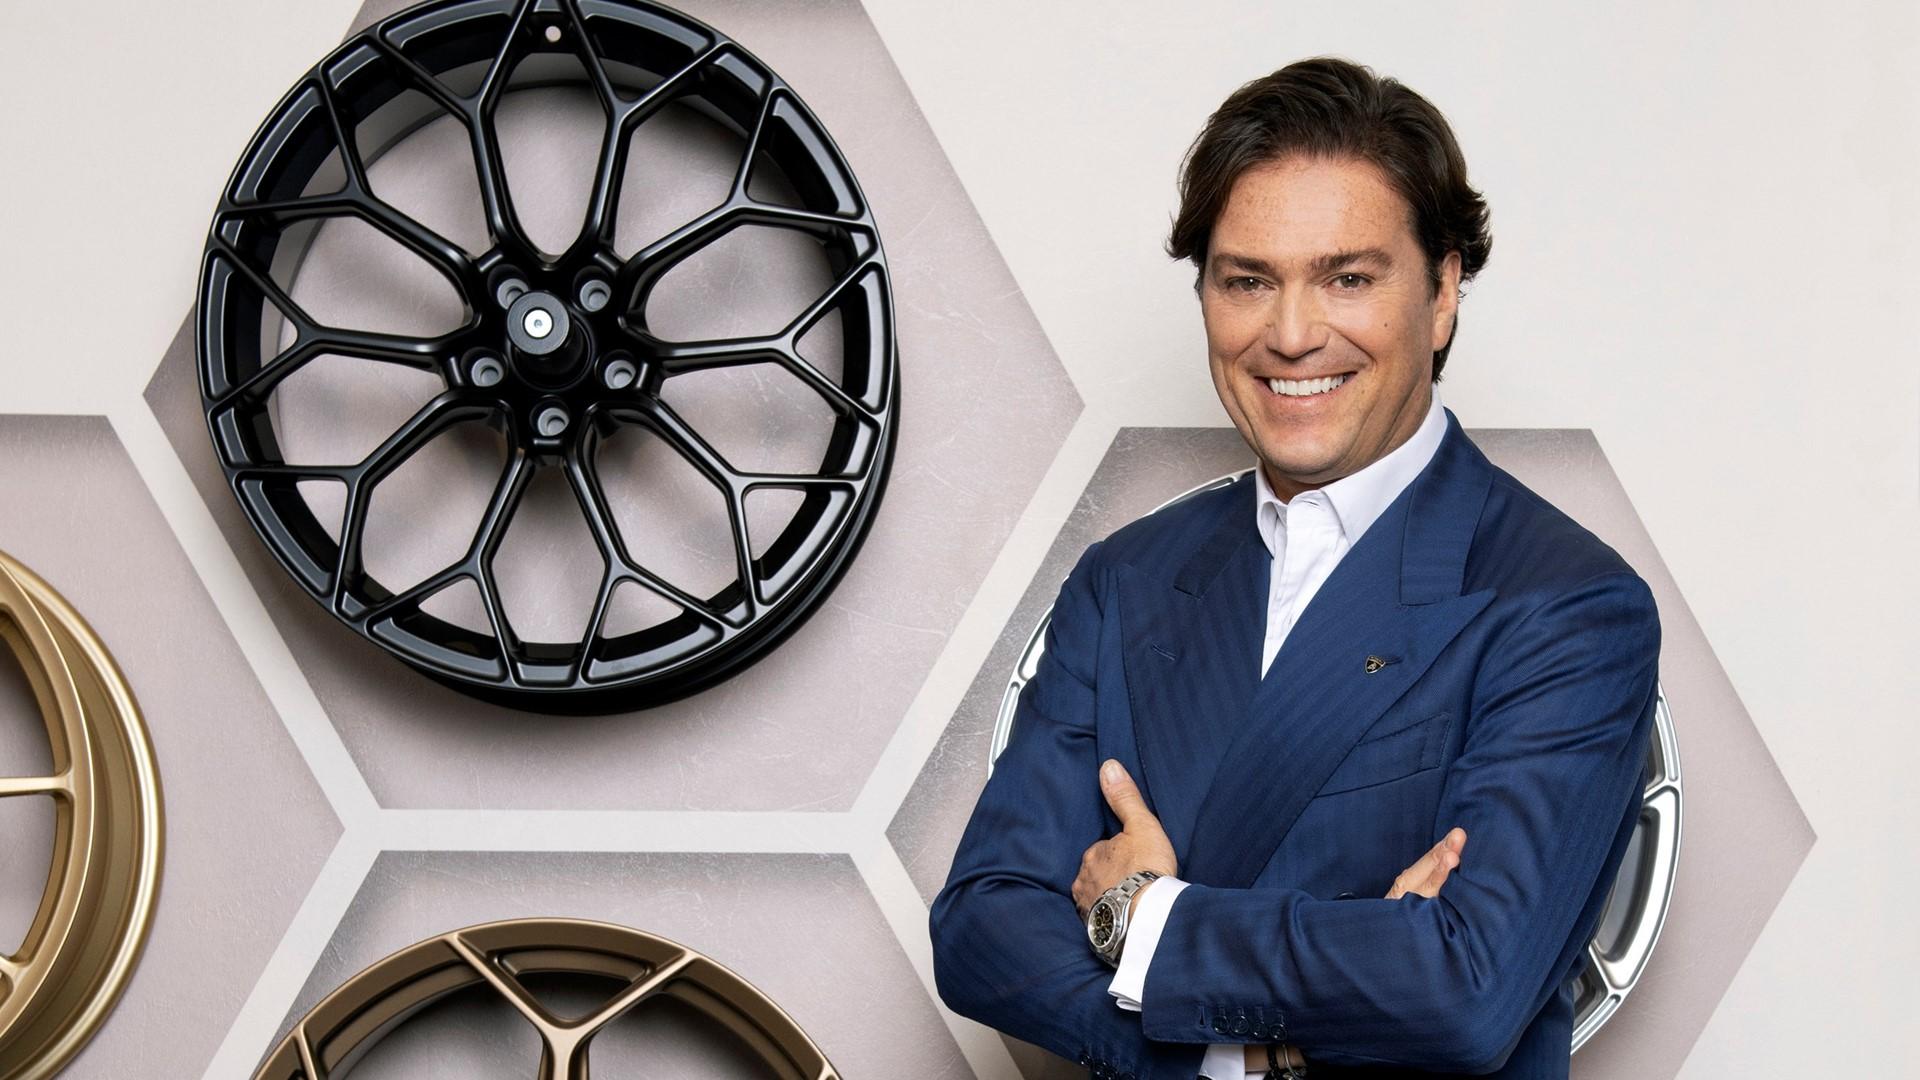 Automobili Lamborghini makes new Board of Management appointments - Image 2